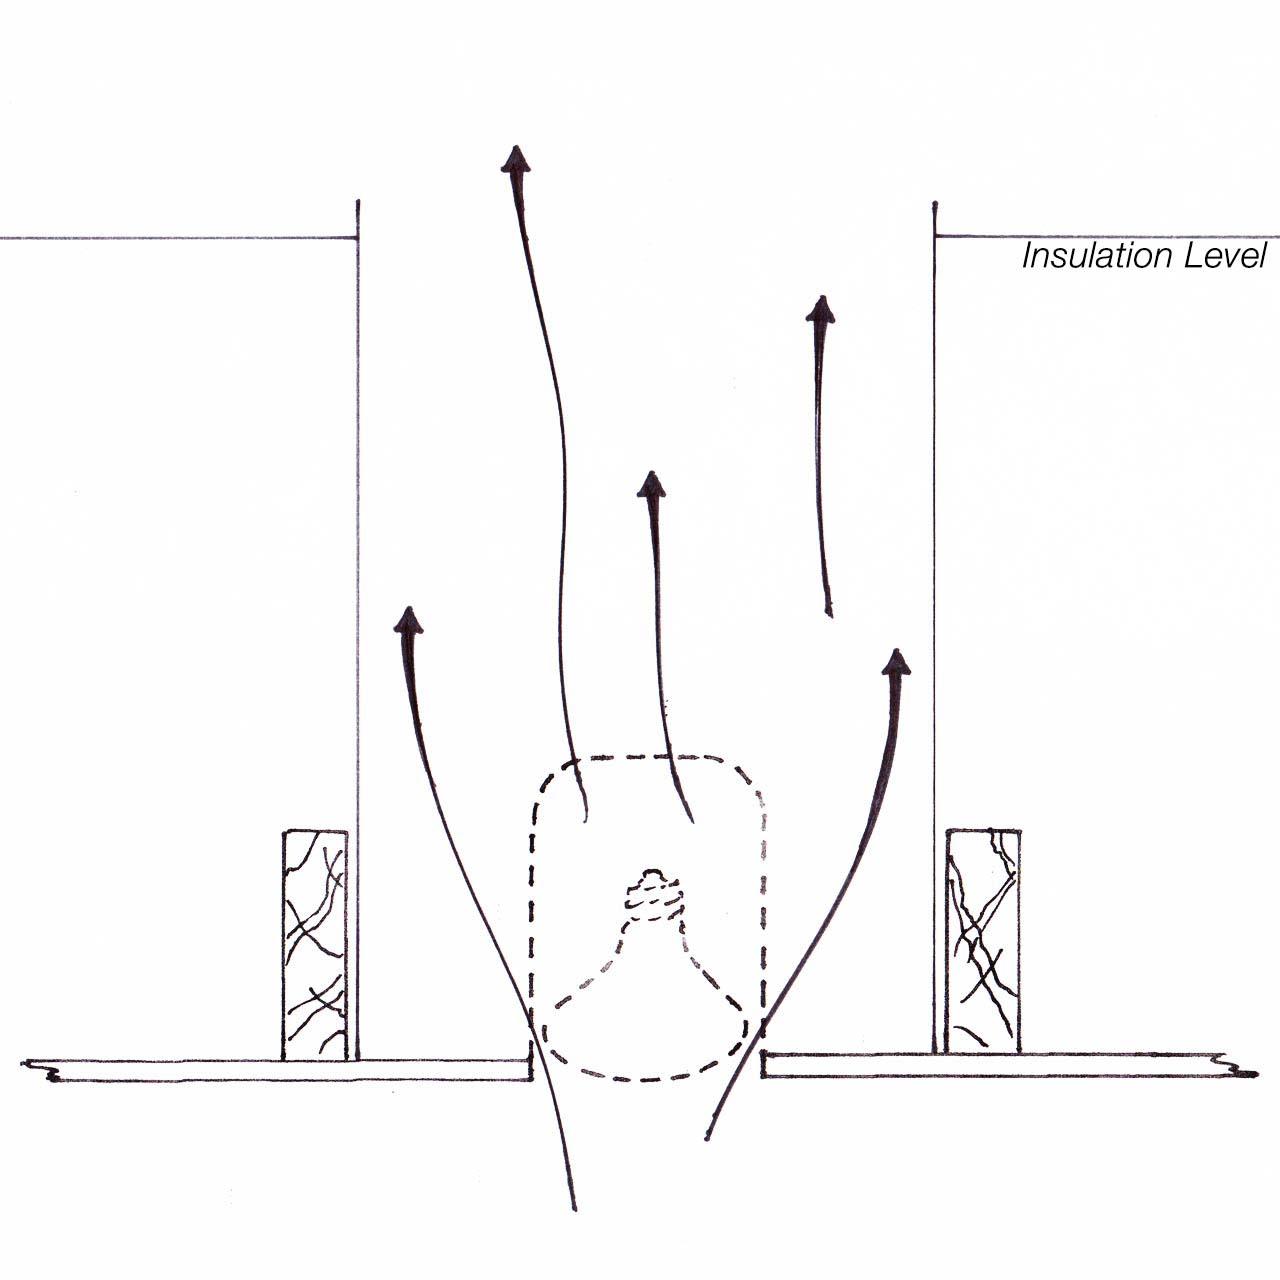 hole-in-insulation-dynamics.jpg